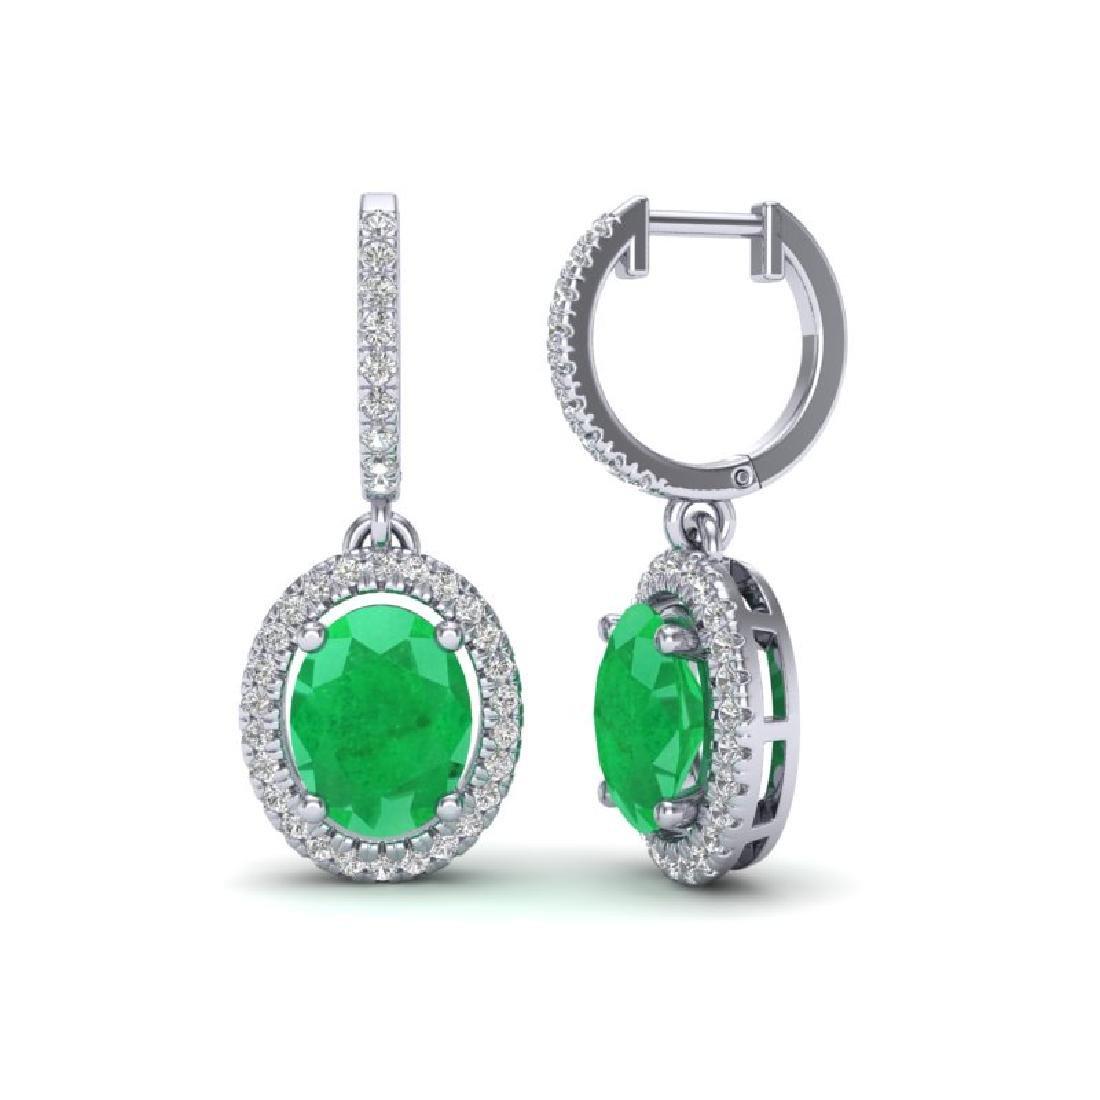 4.25 CTW Emerald & Micro Pave VS/SI Diamond Earrings - 2